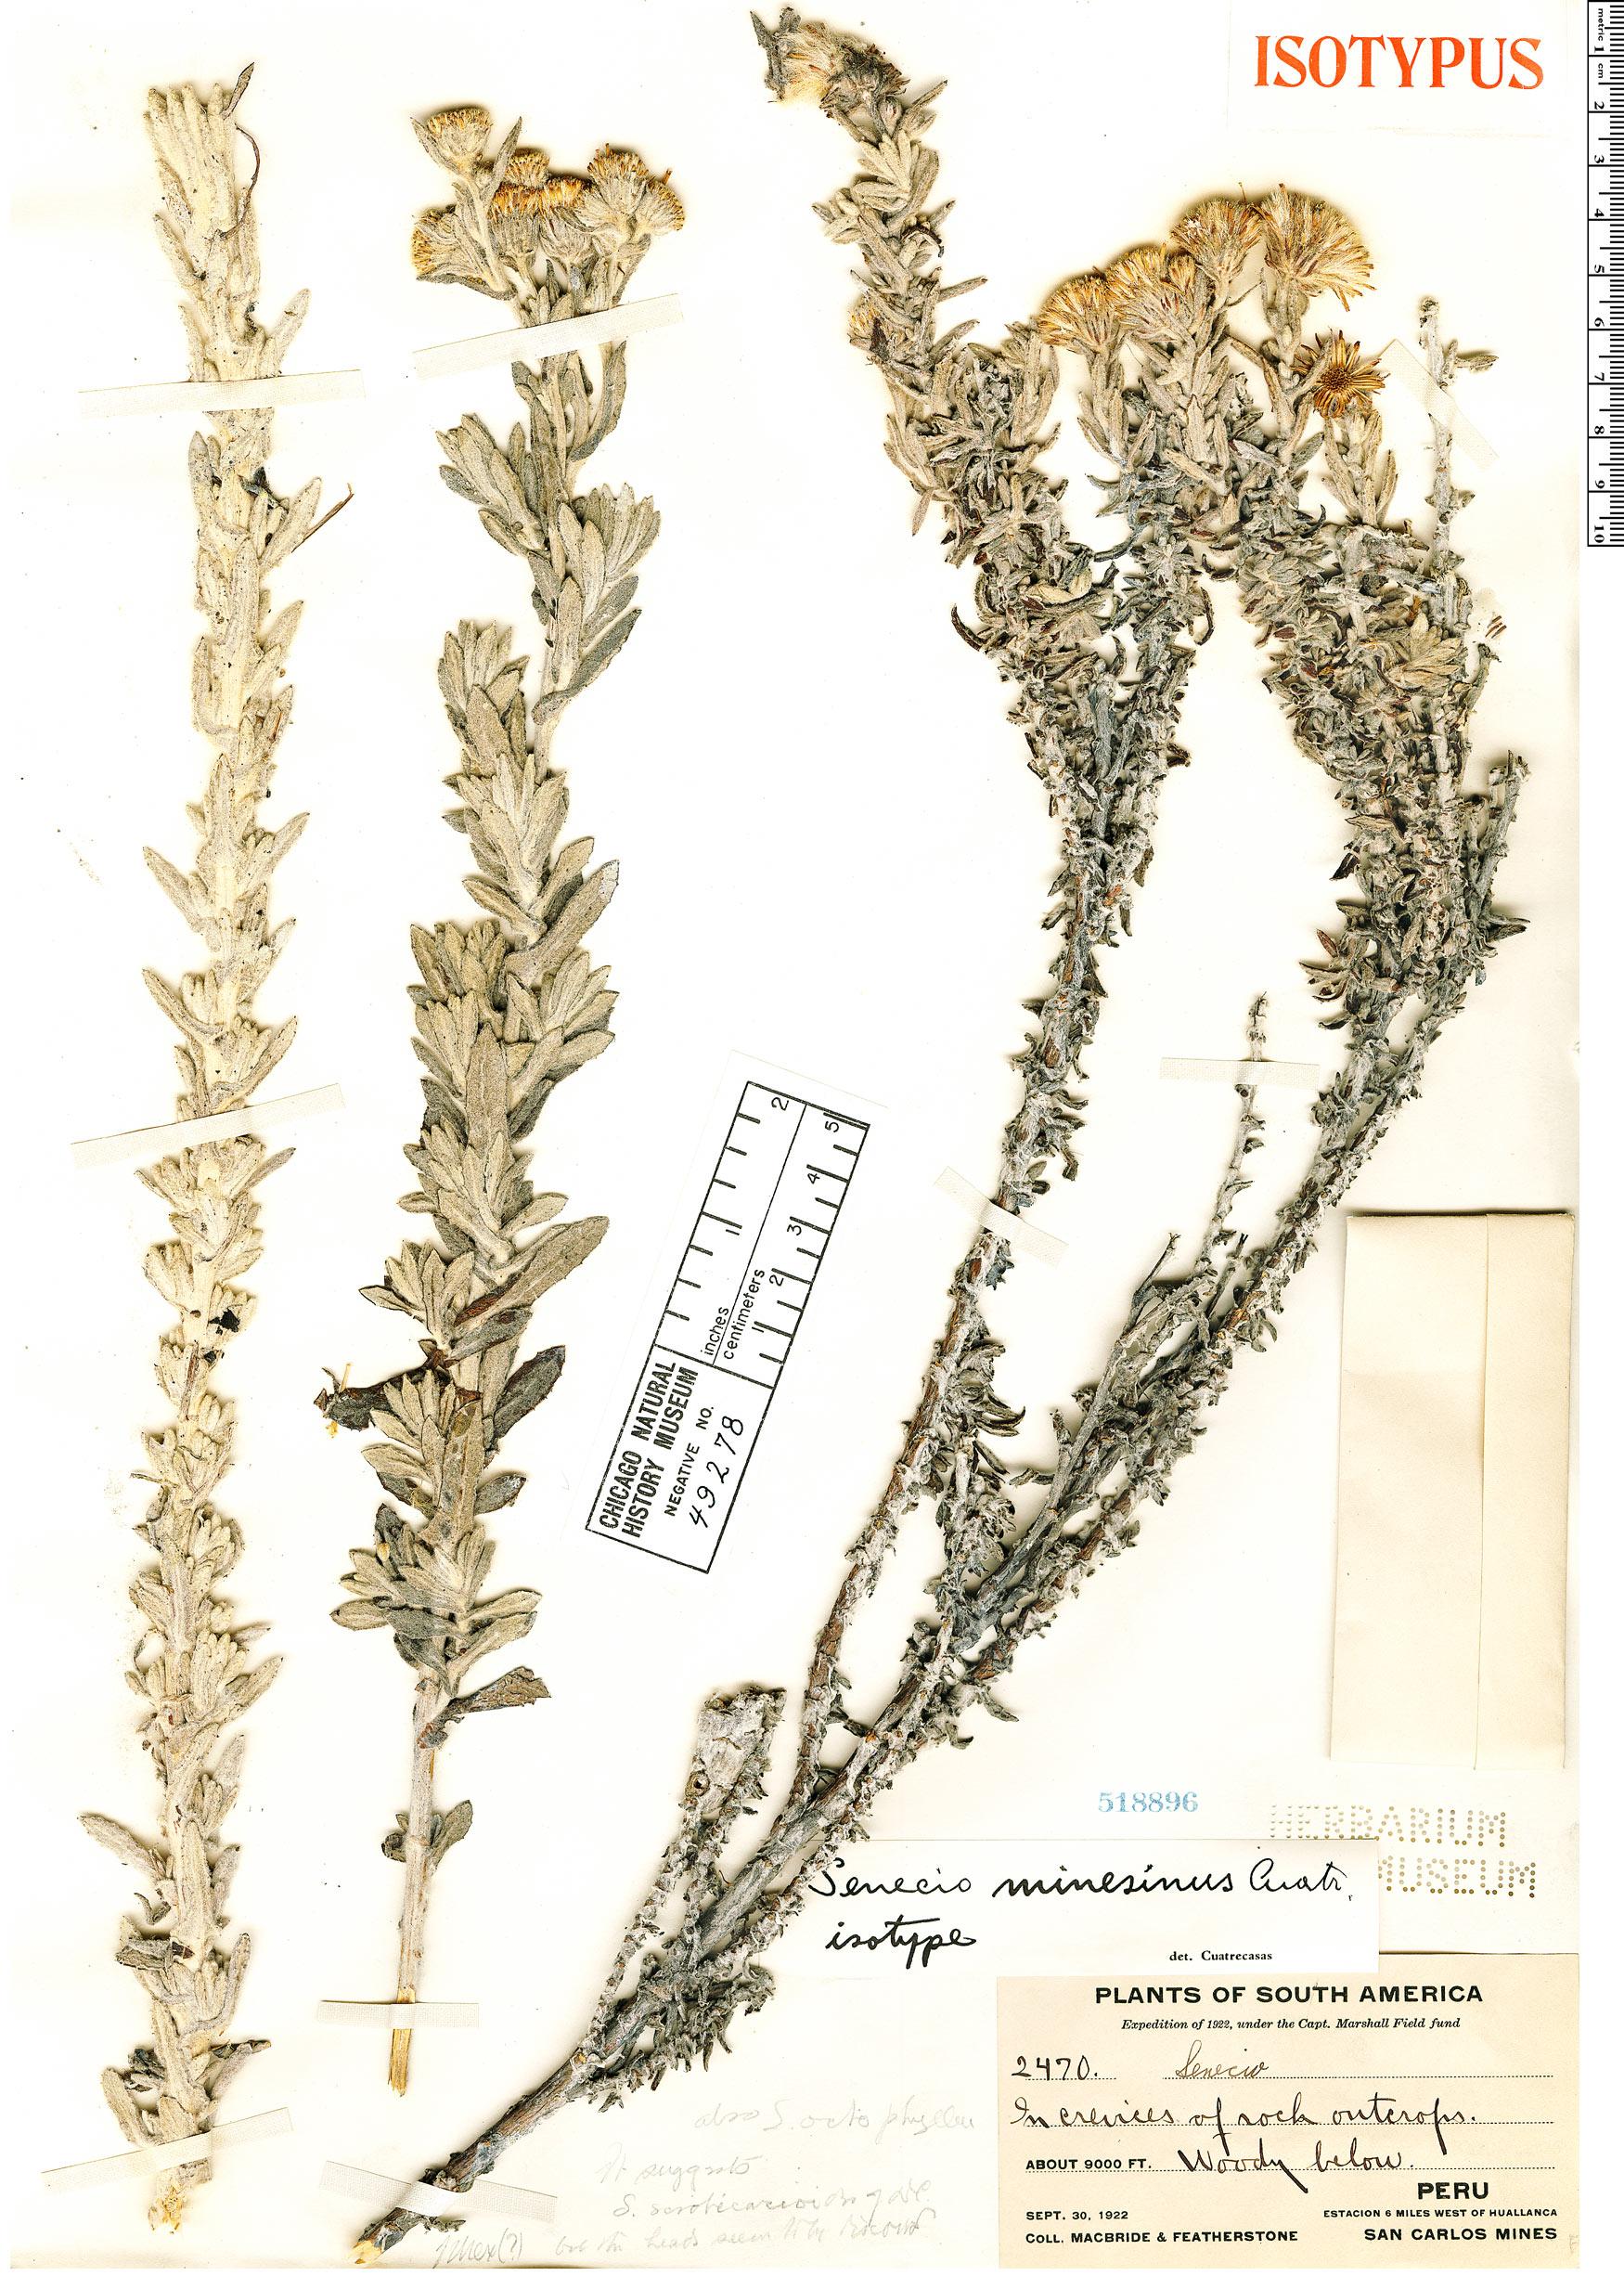 Specimen: Senecio minesinus